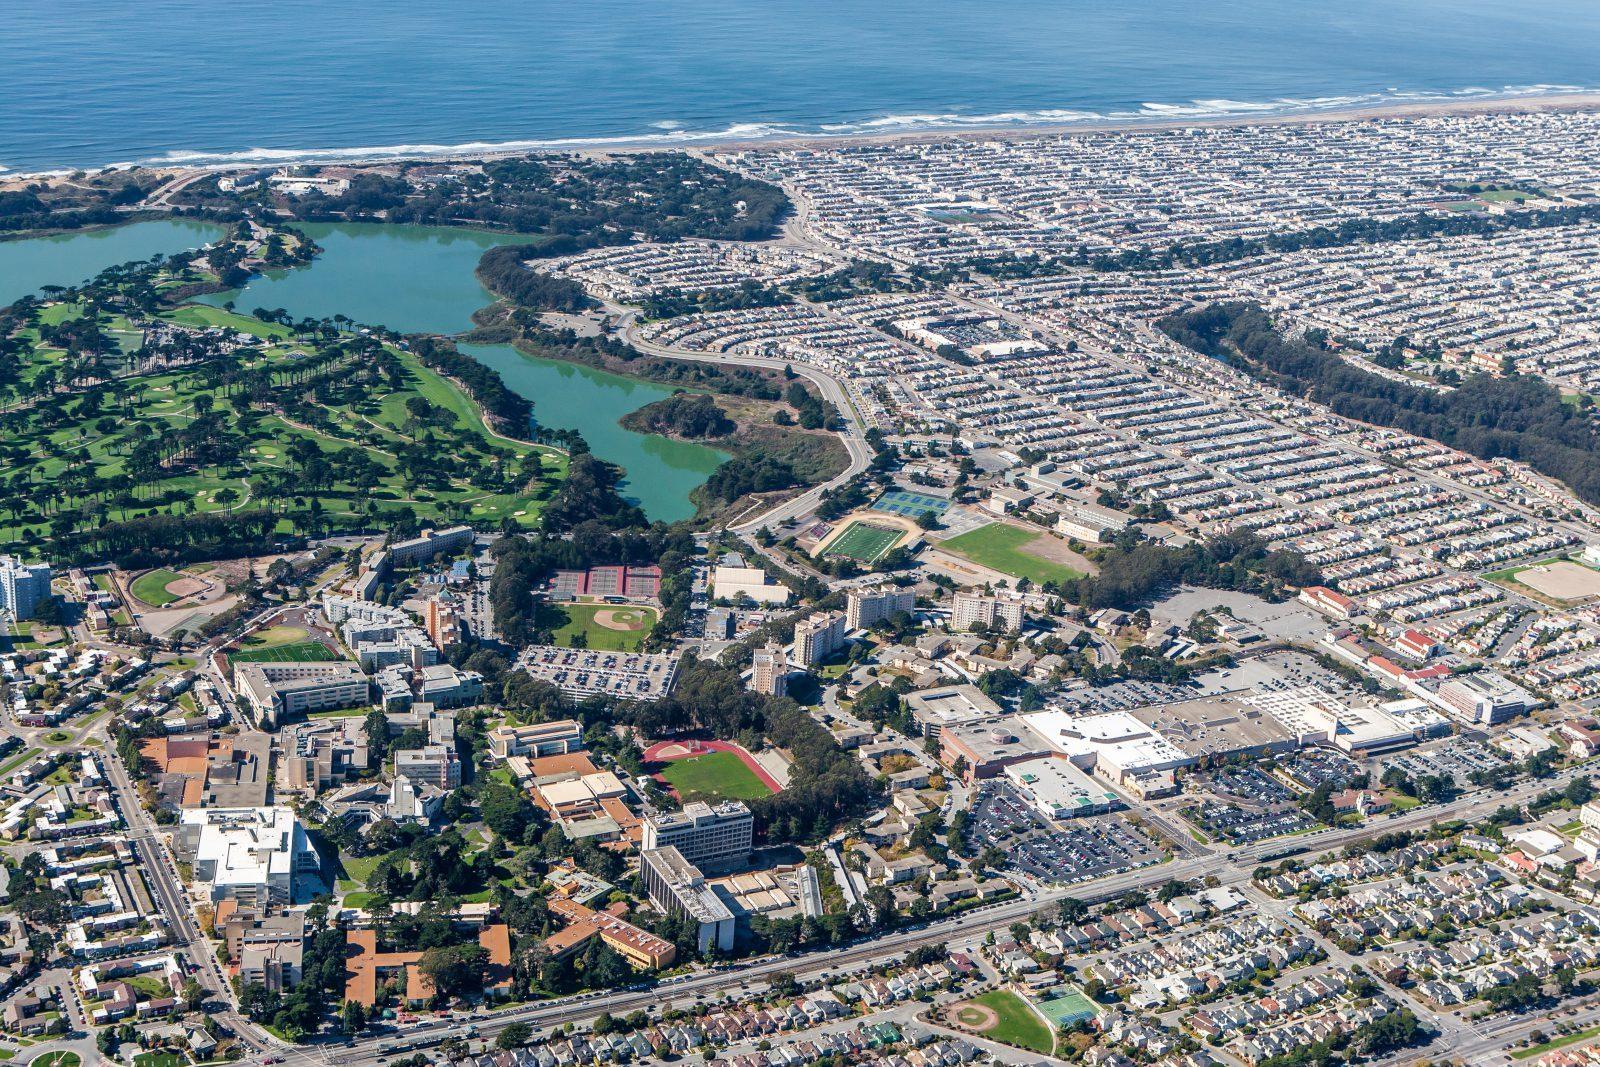 Flygbild över San Francisco